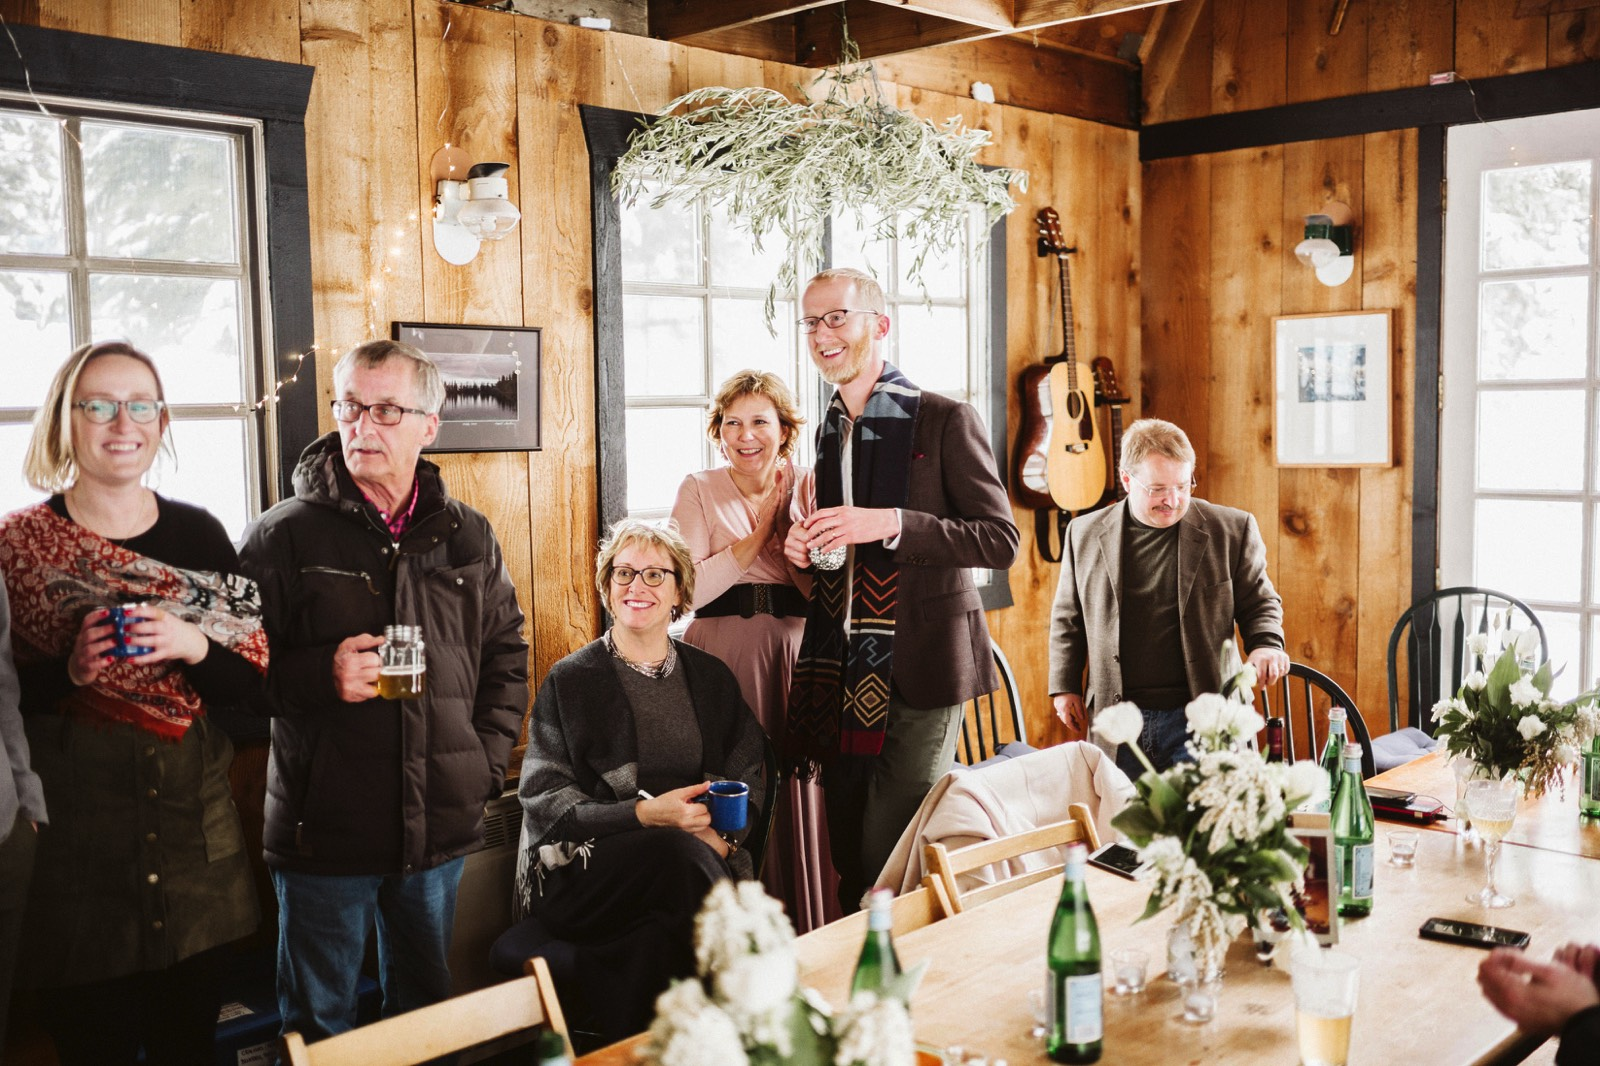 alpine-lakes-high-camp-winter-wedding-70 ALPINE LAKES HIGH CAMP WEDDING